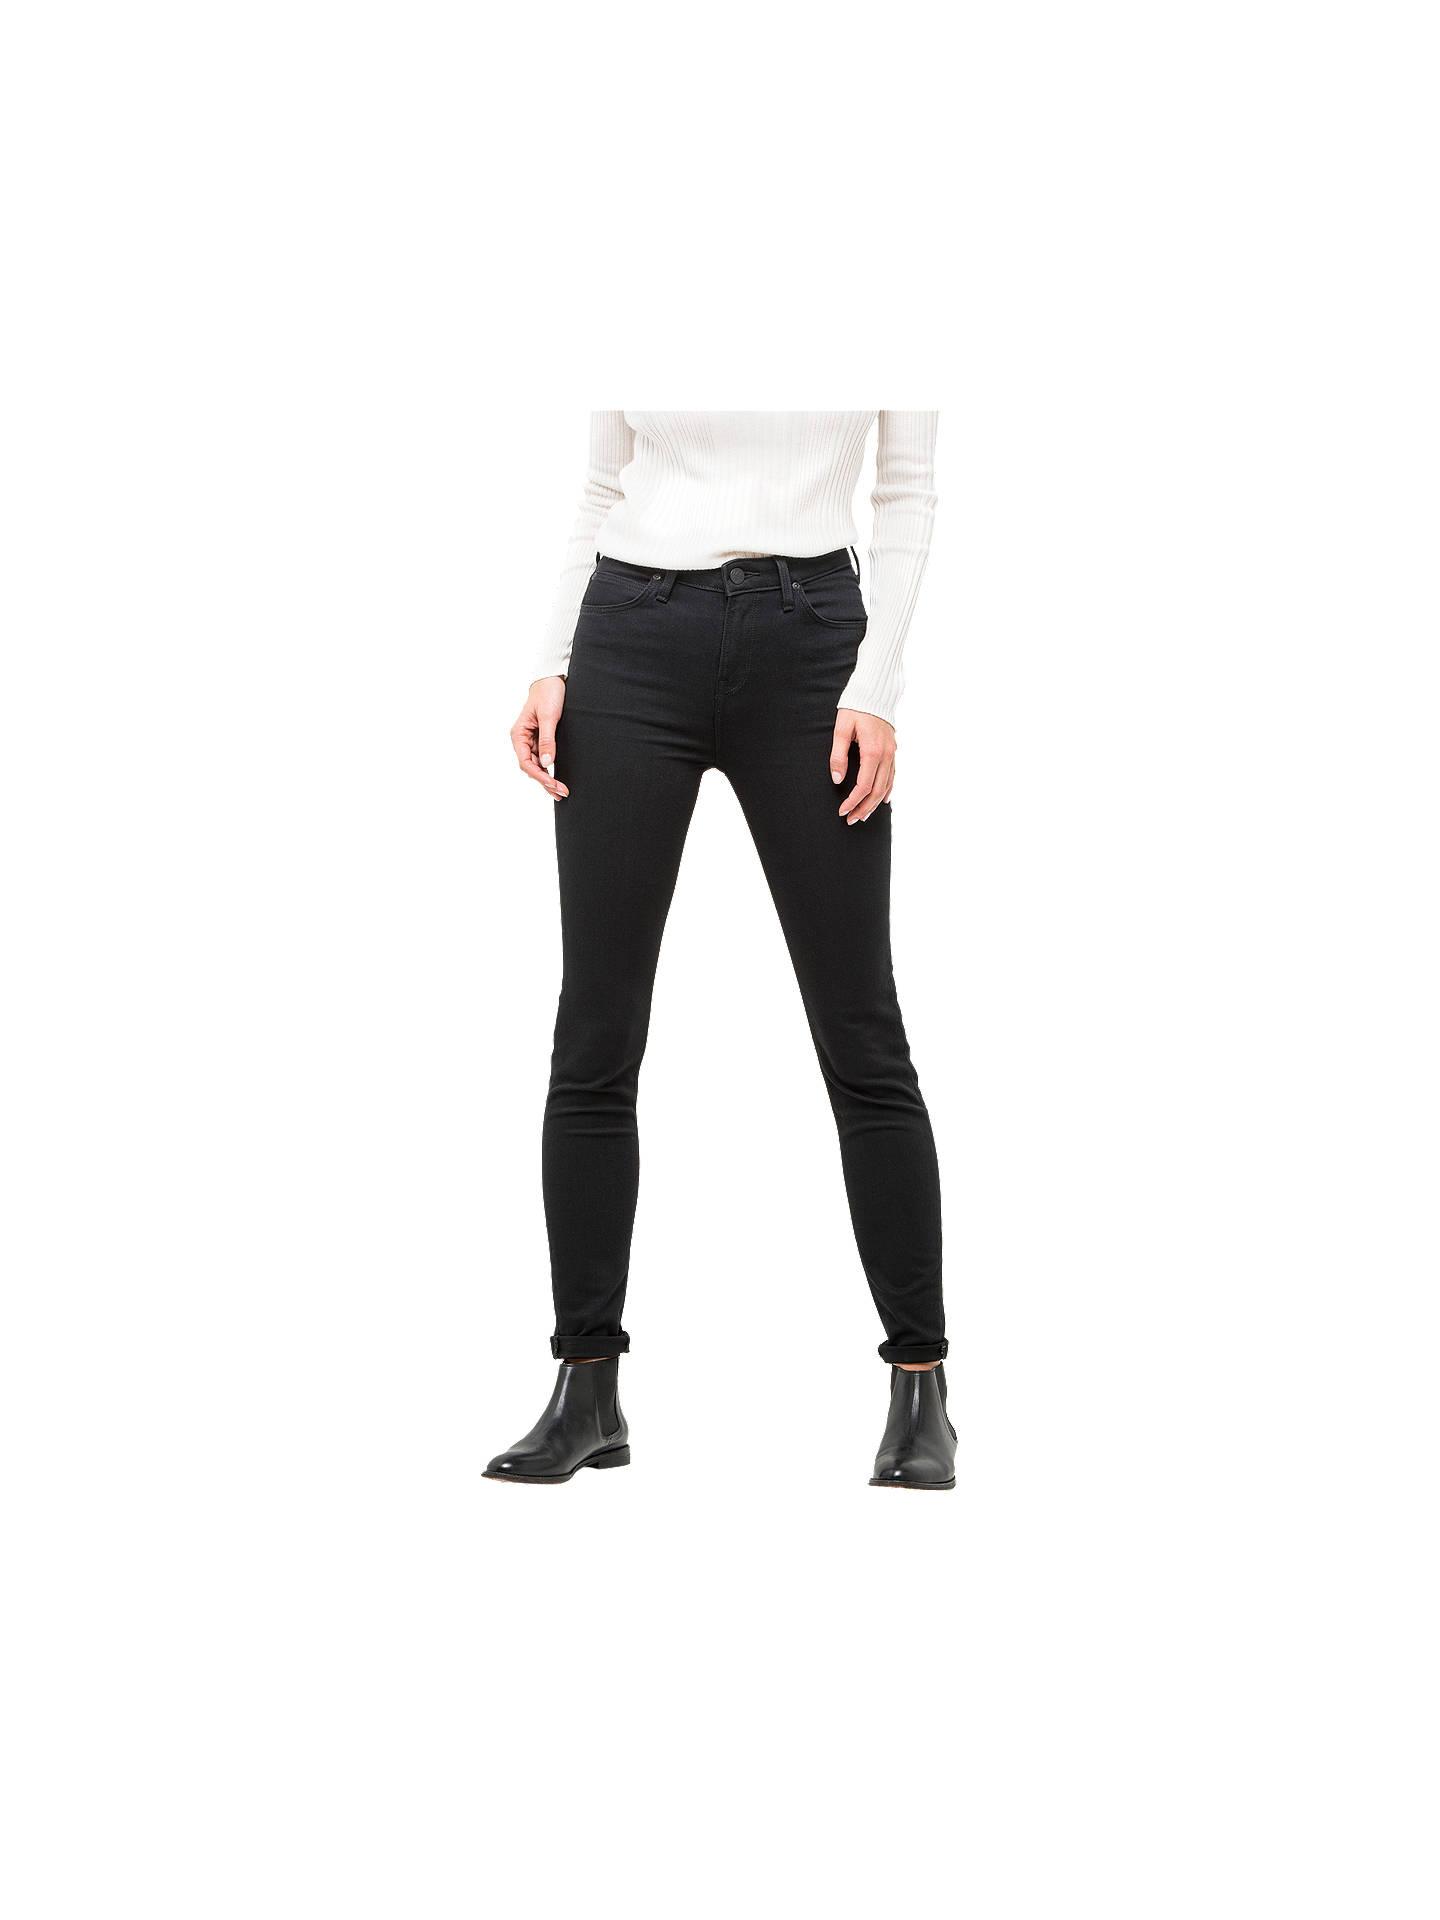 3ad8f711 Buy Lee Scarlett High Waist Skinny Jeans, Black Rinse, W27/L31 Online at ...